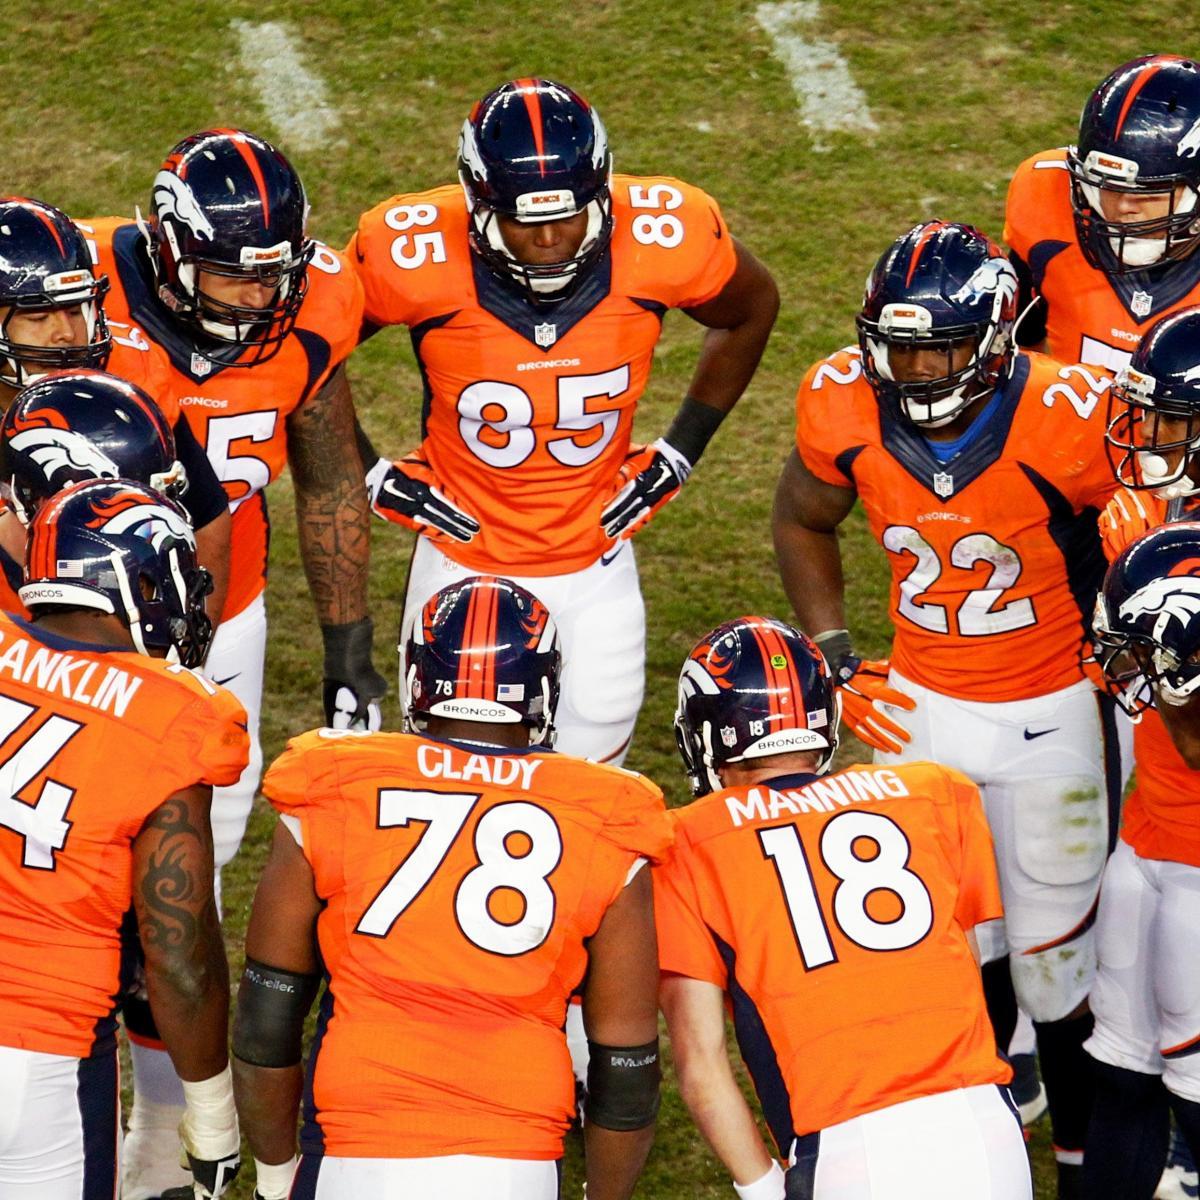 Denver News A Line: Denver Broncos Looking To Overhaul Offensive Line In 2015